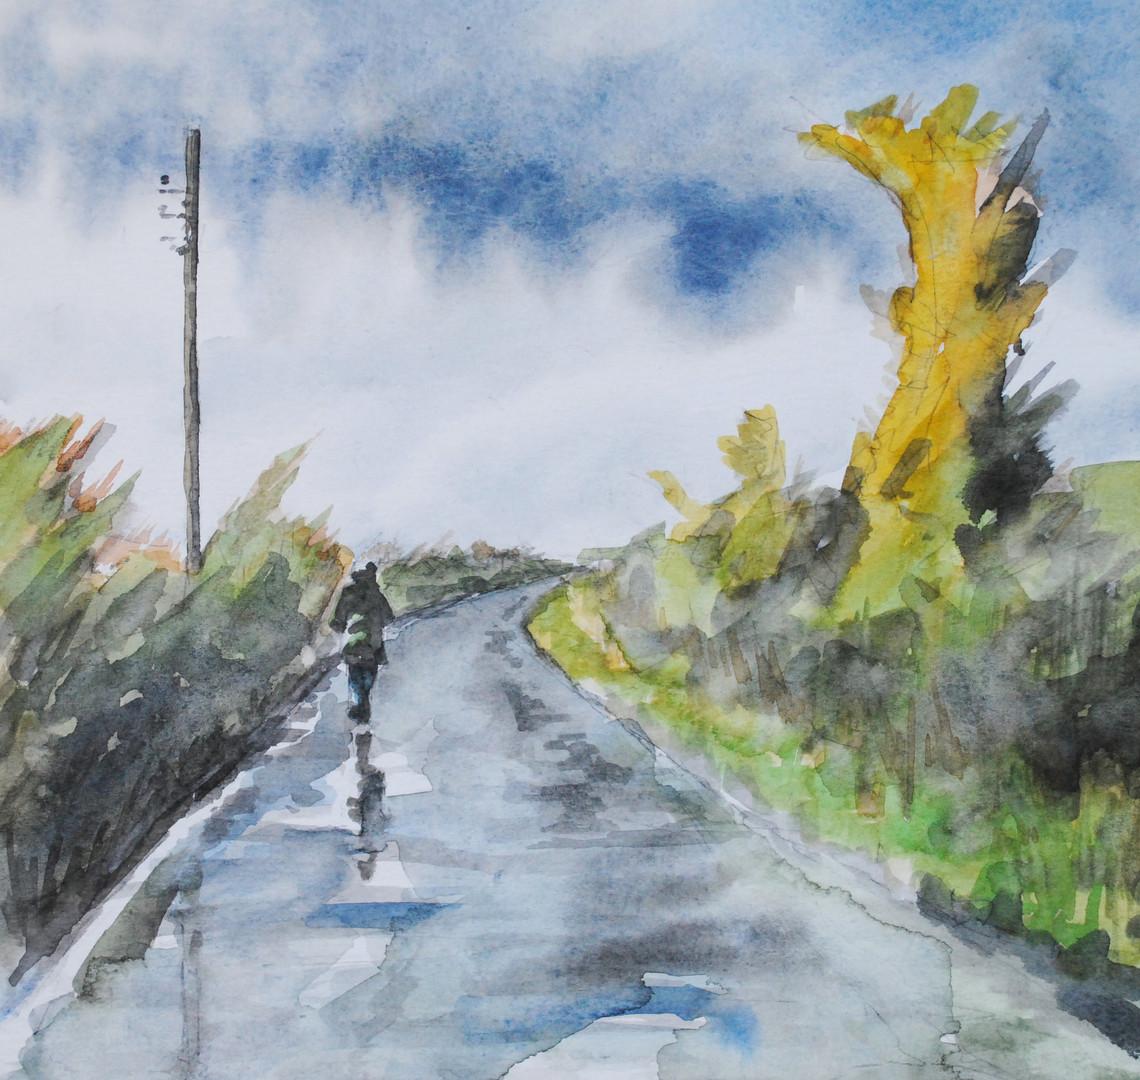 Walks with Brigitte - in rain